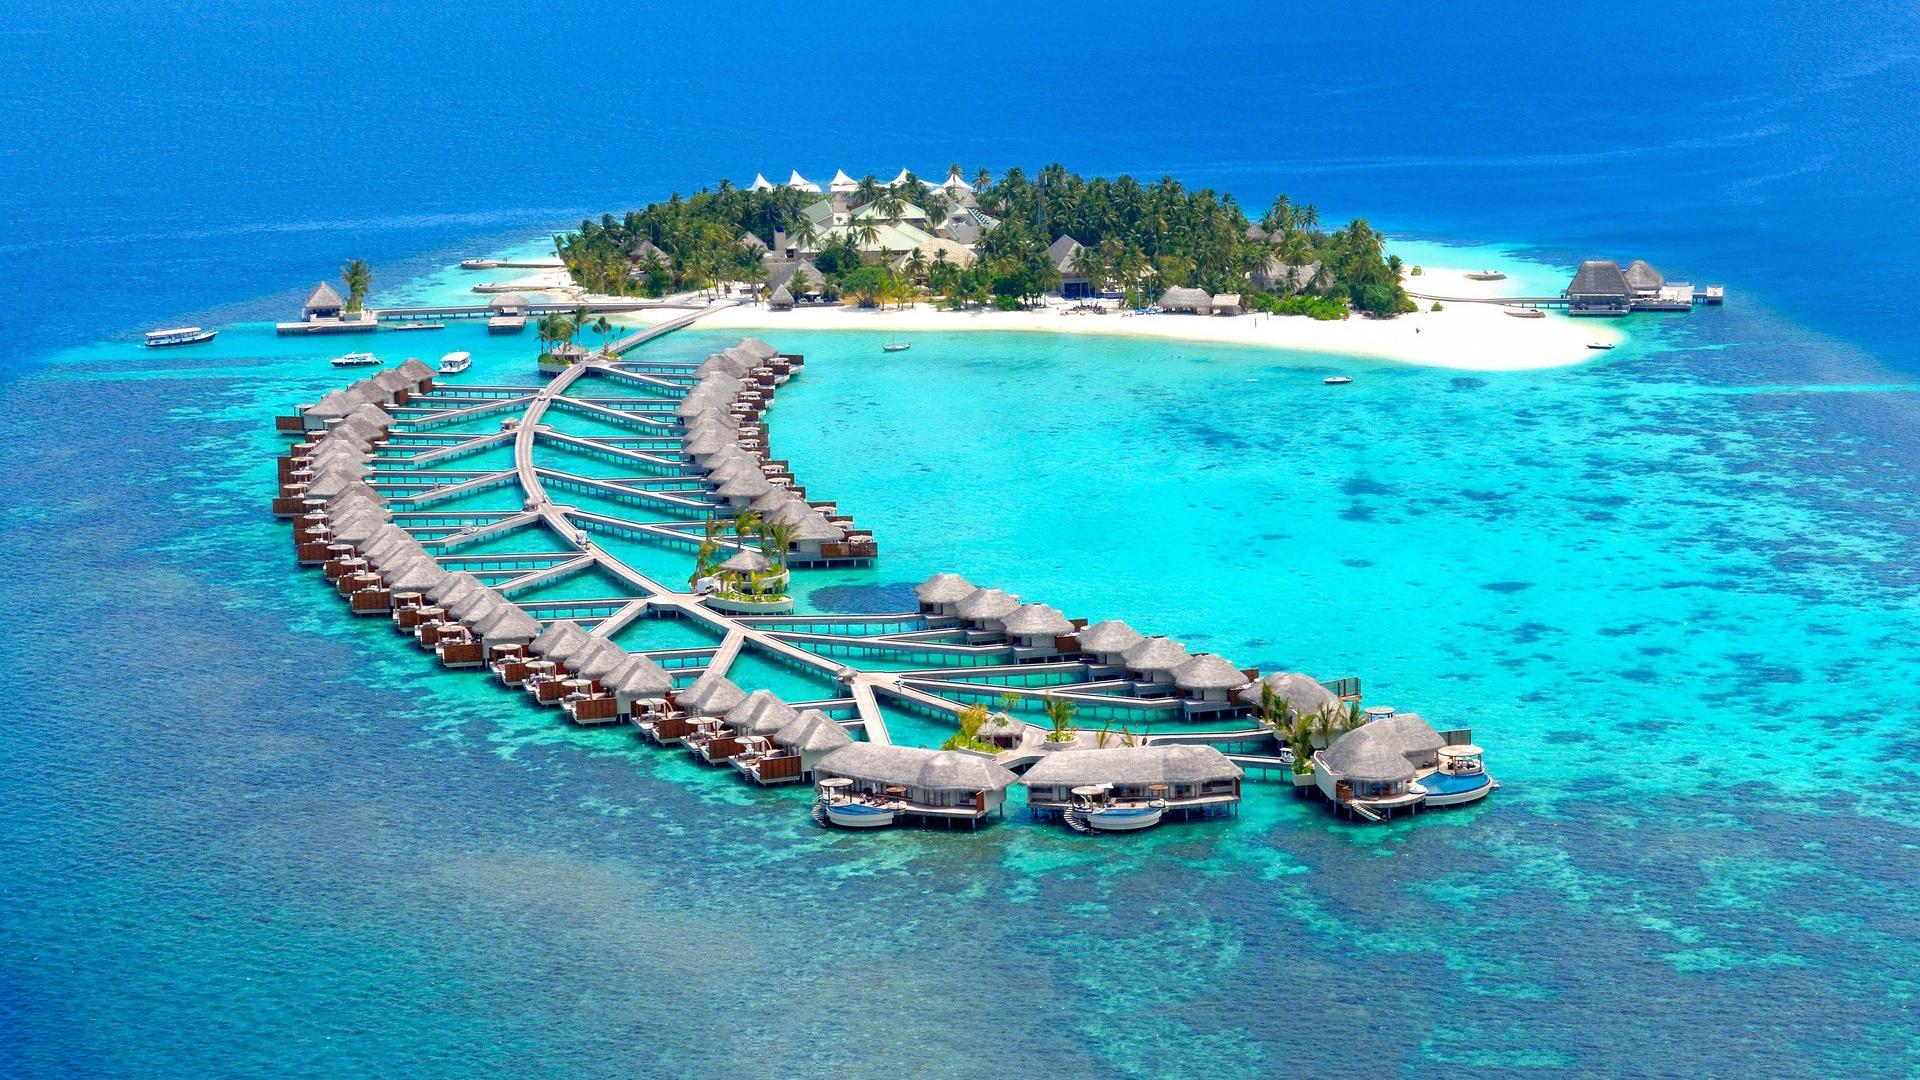 Beautiful Maldives Island Wallpaper Background 6046 Wallpaper High 1920x1080